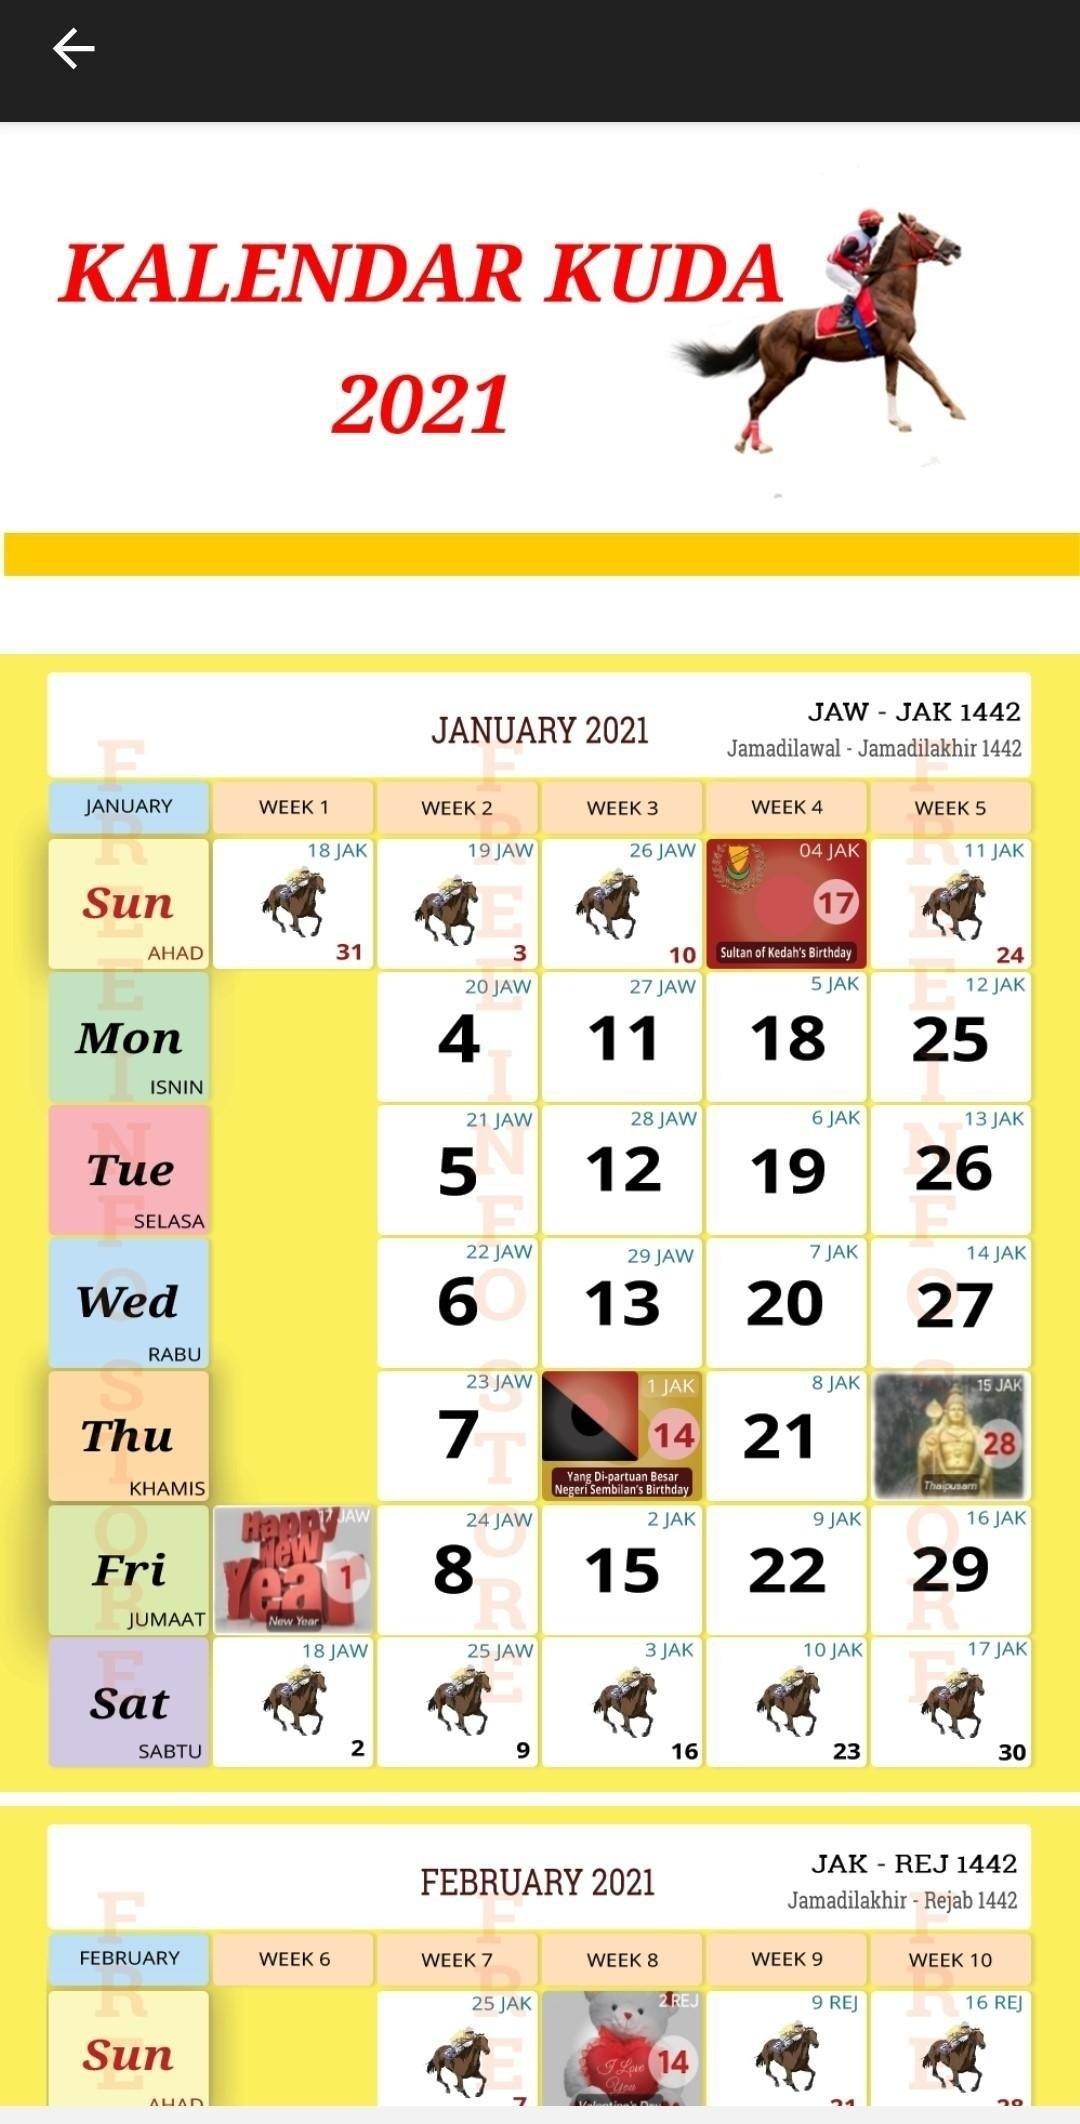 Kuda 2021 Calender | Month Calendar Printable for Kalender 2021 Malaysia Cuti Sekolah Graphics